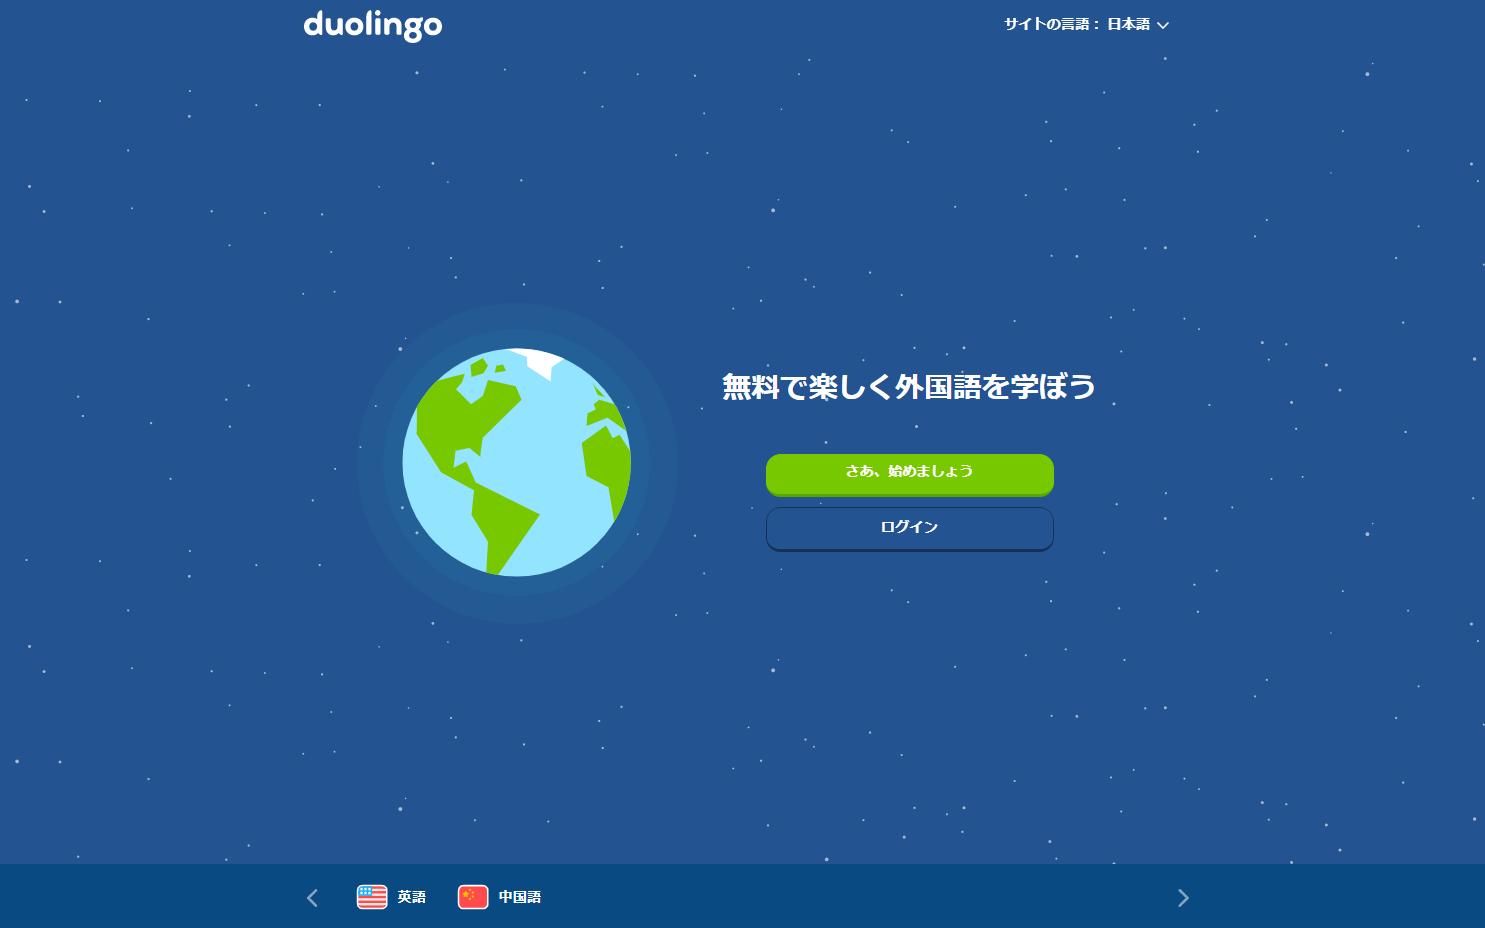 duolingoのホーム画面